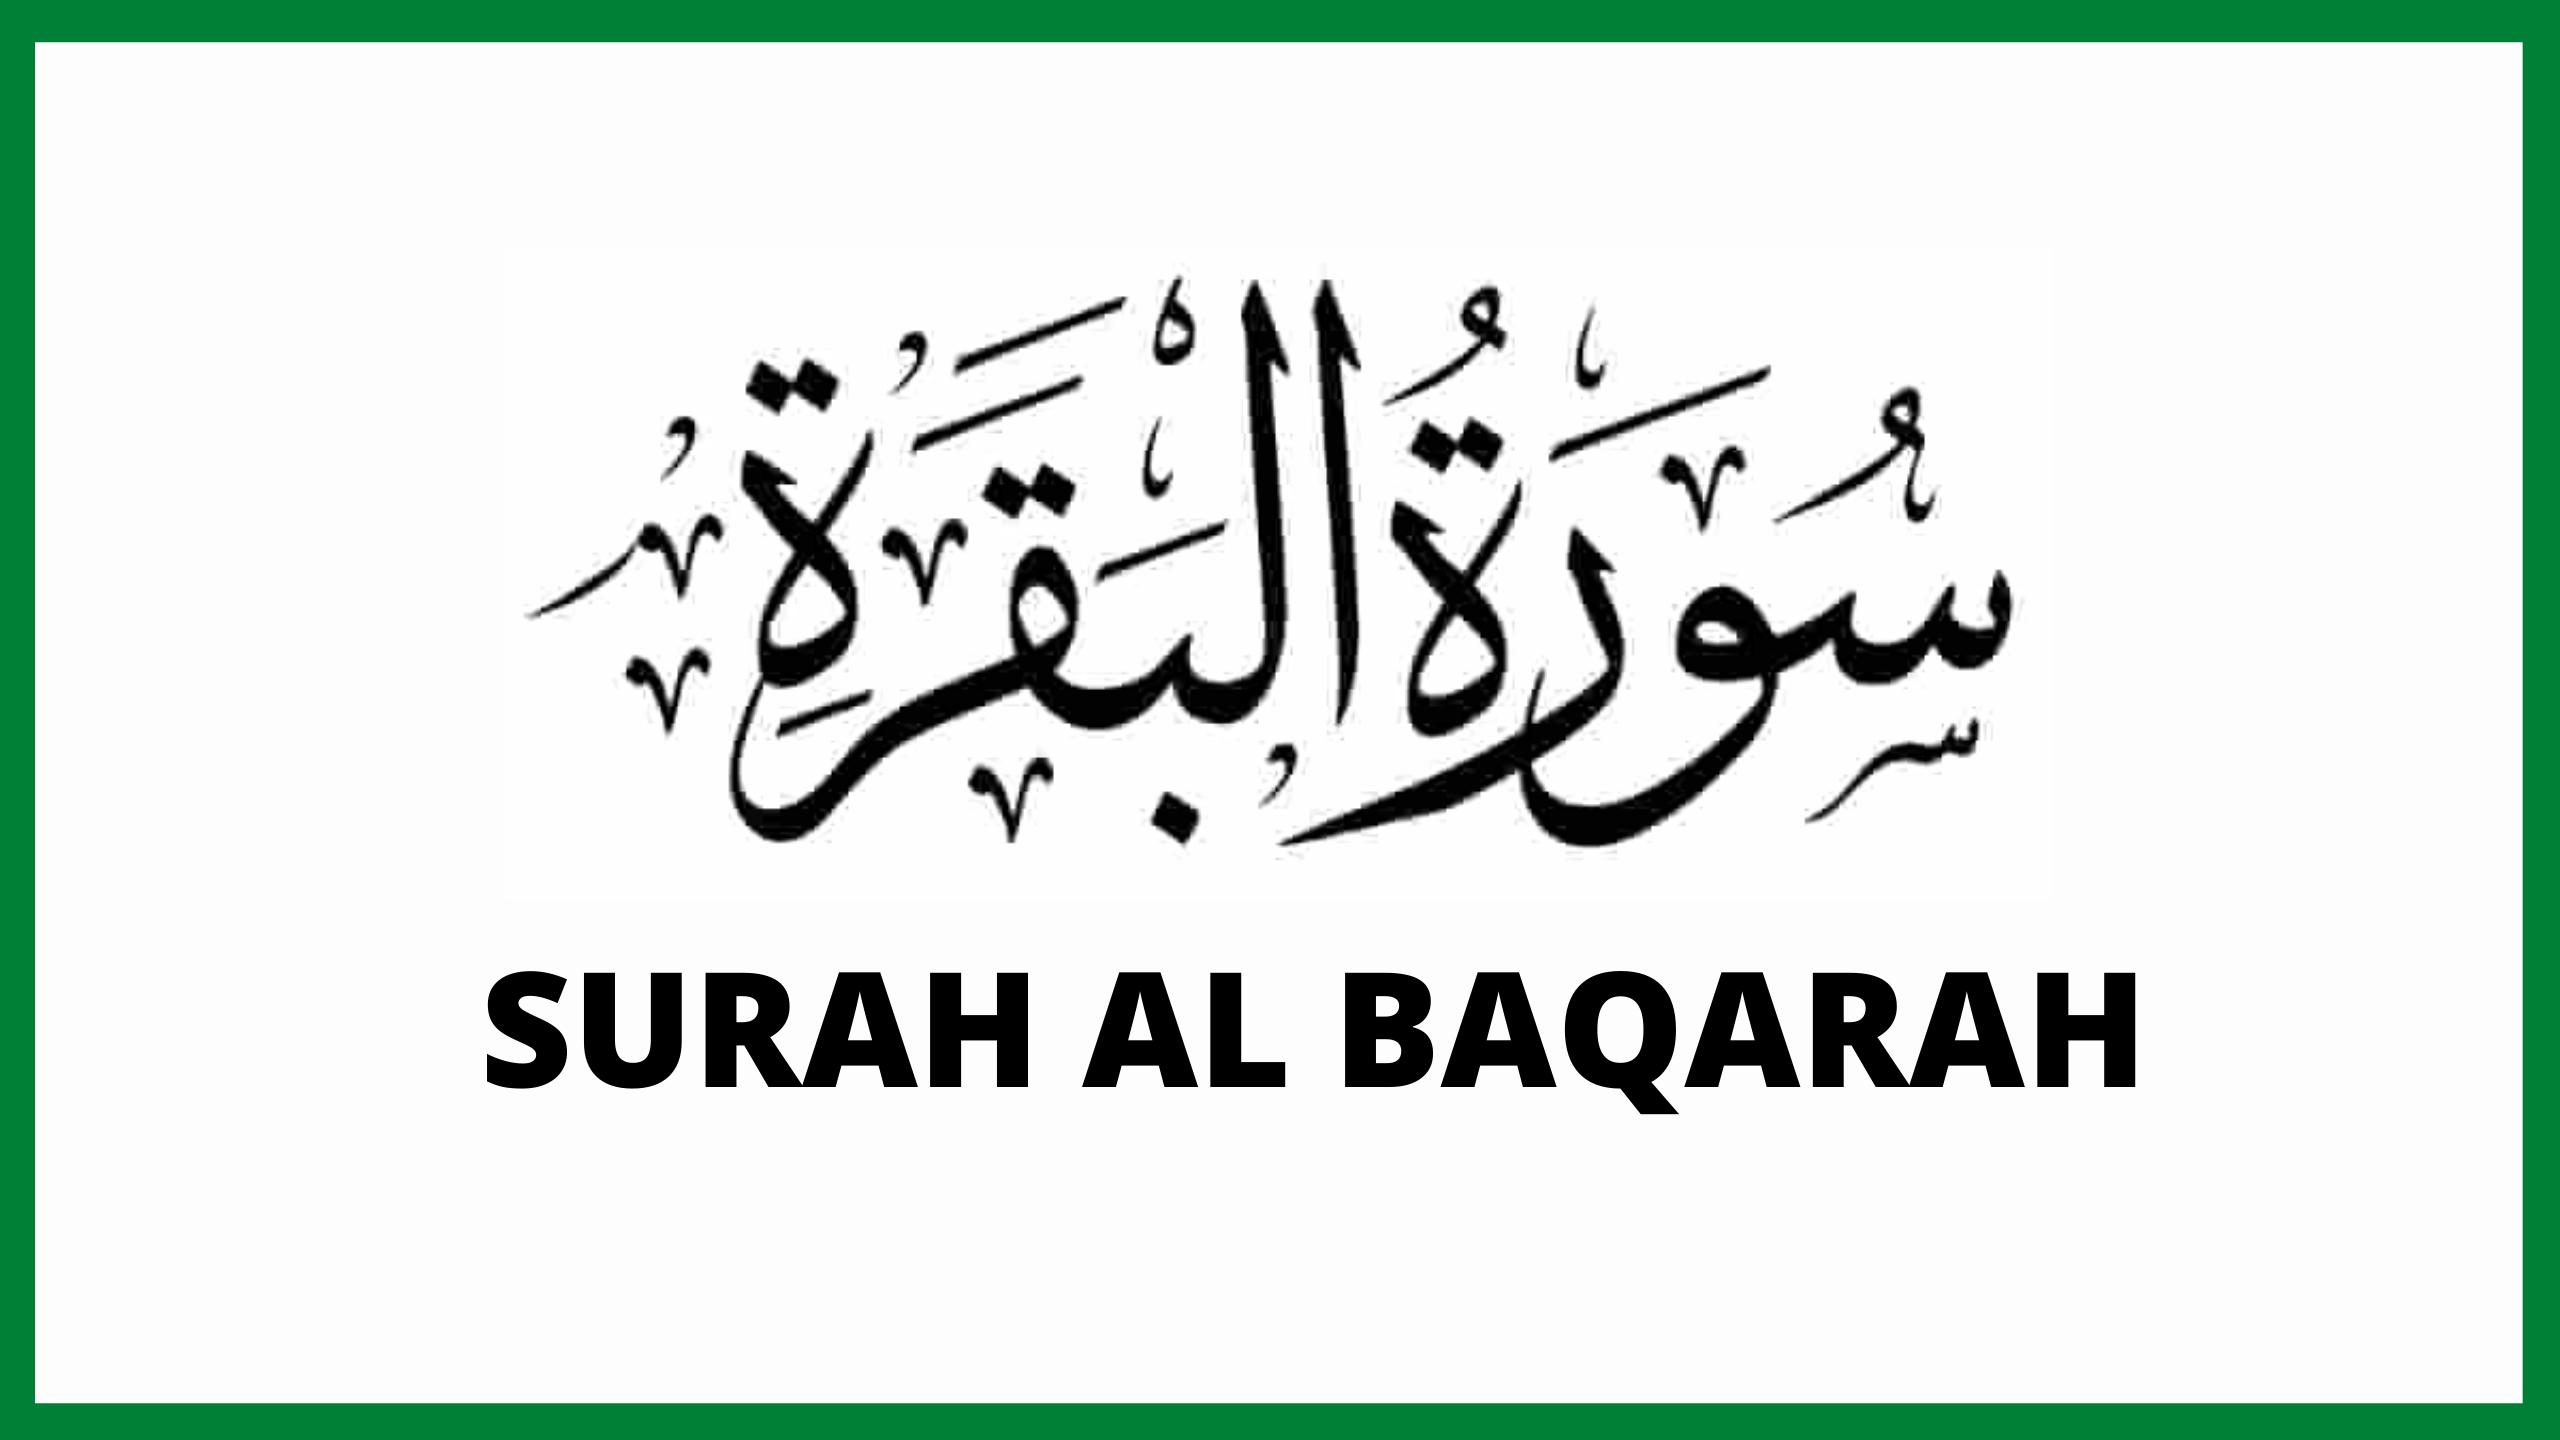 Sourate AL-BAQARAH / البقرة en arabe | Sourate 2